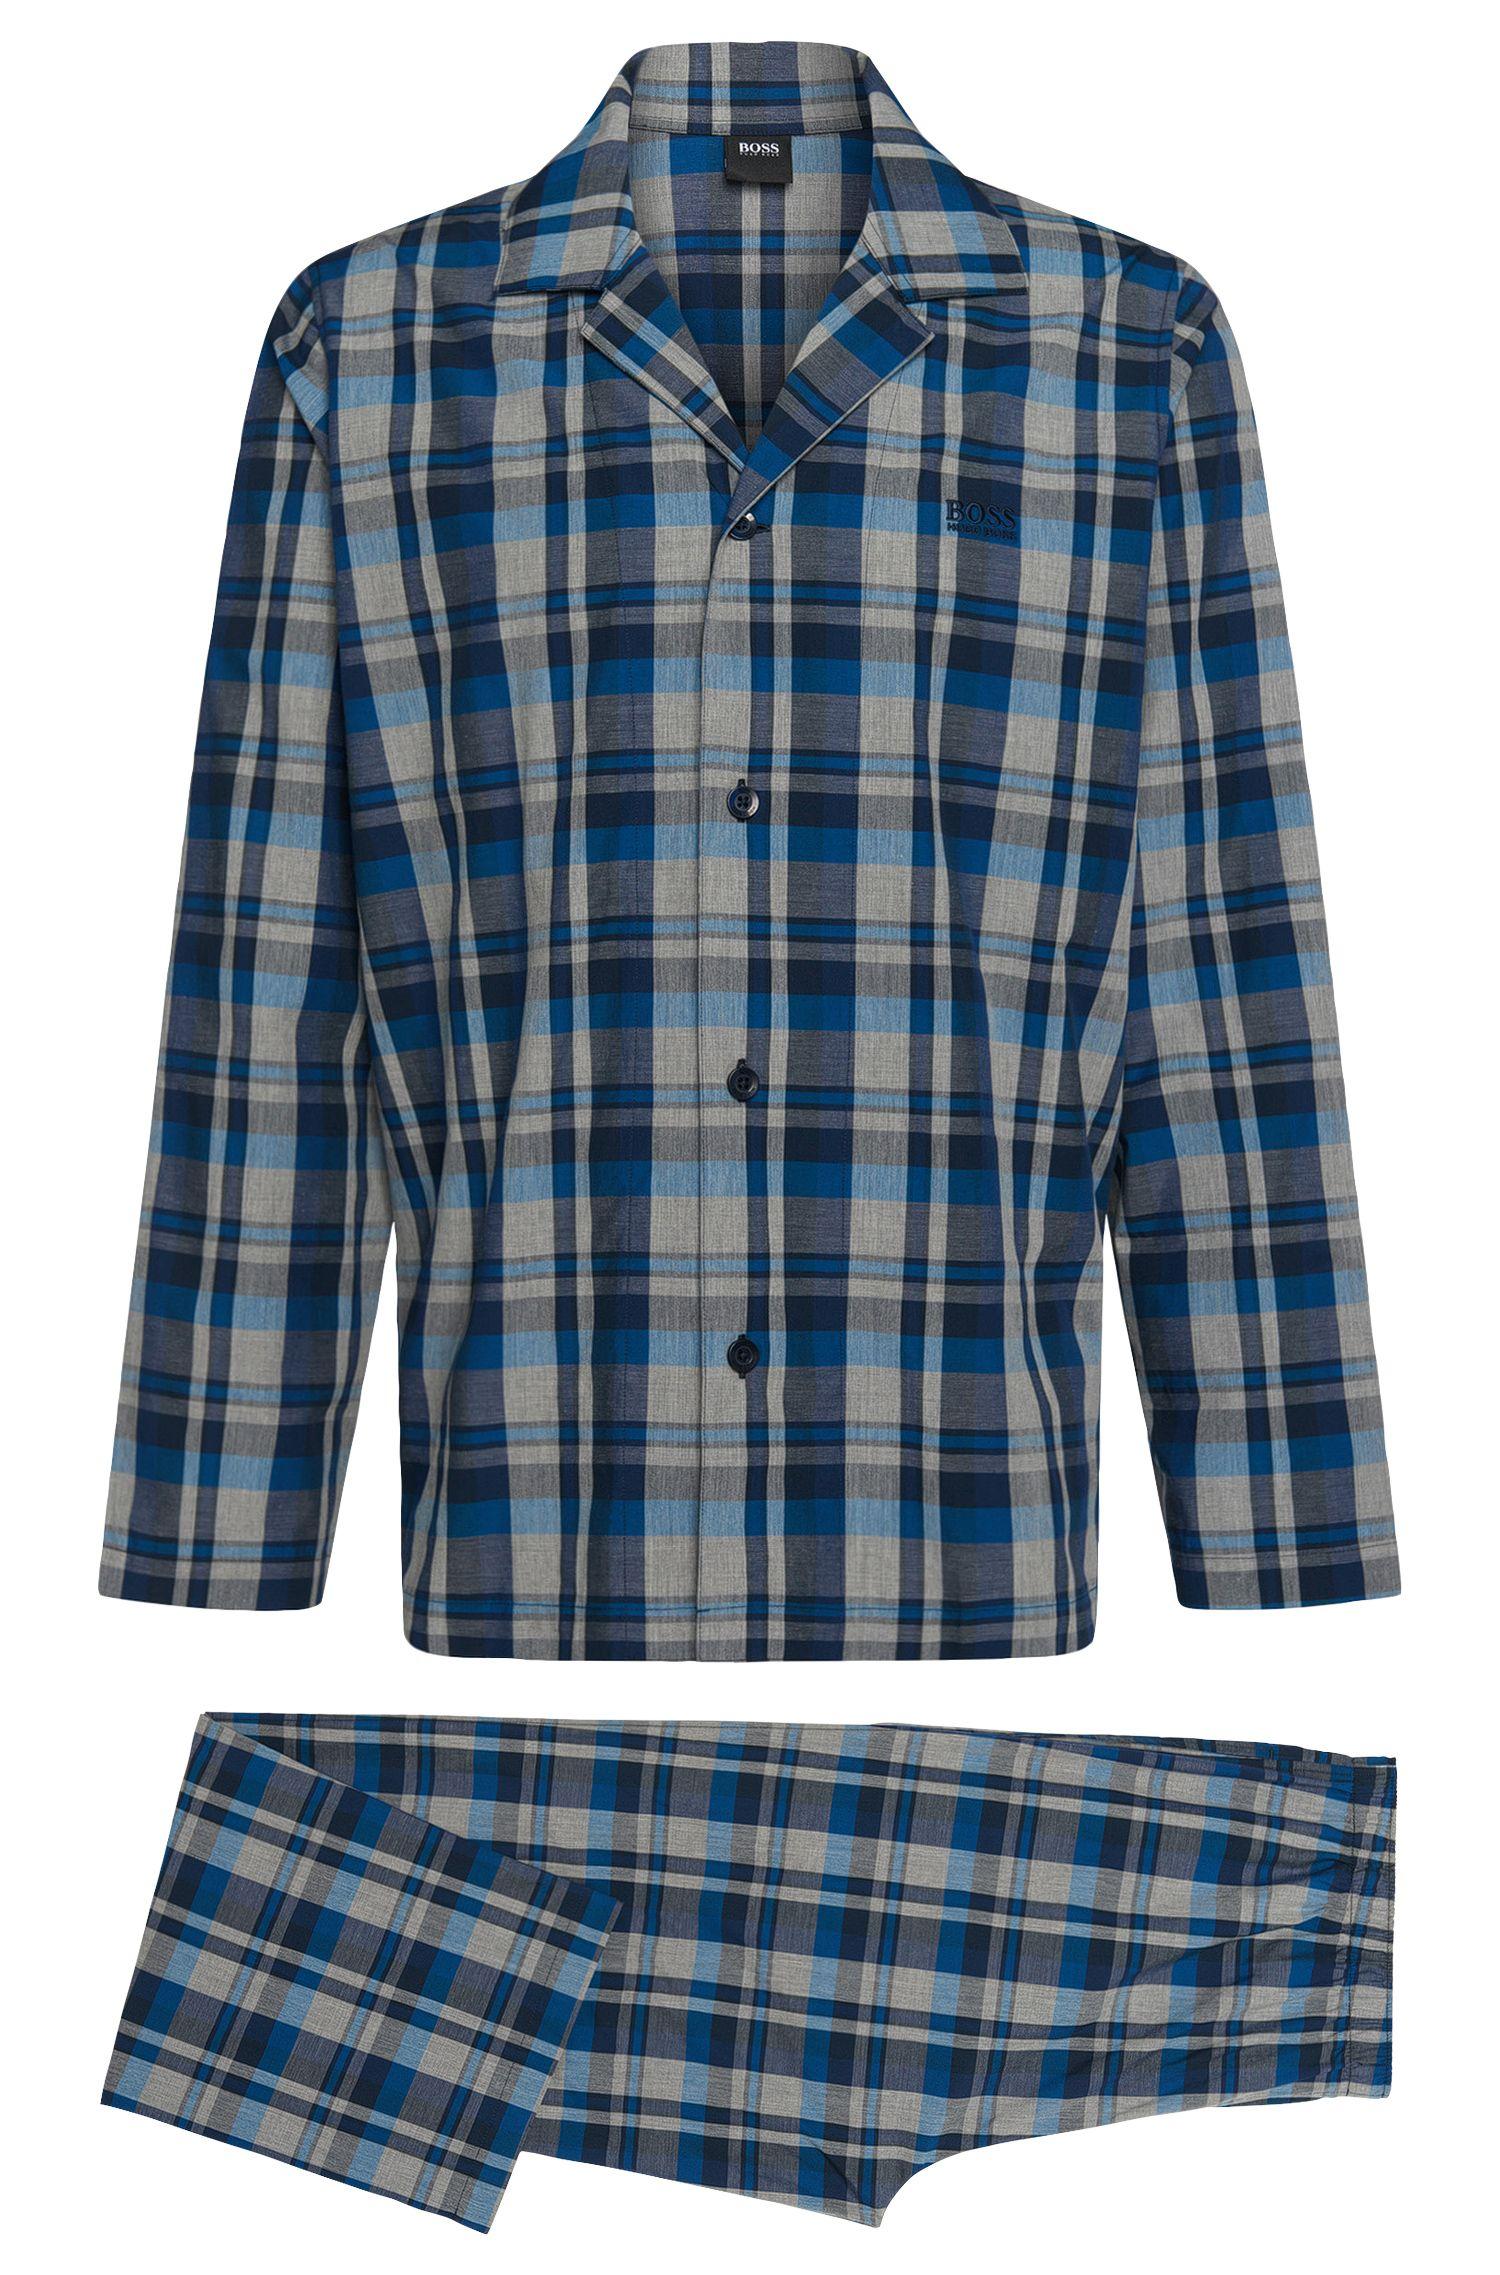 Pijama estampado de algodón: 'Pyjama 1'